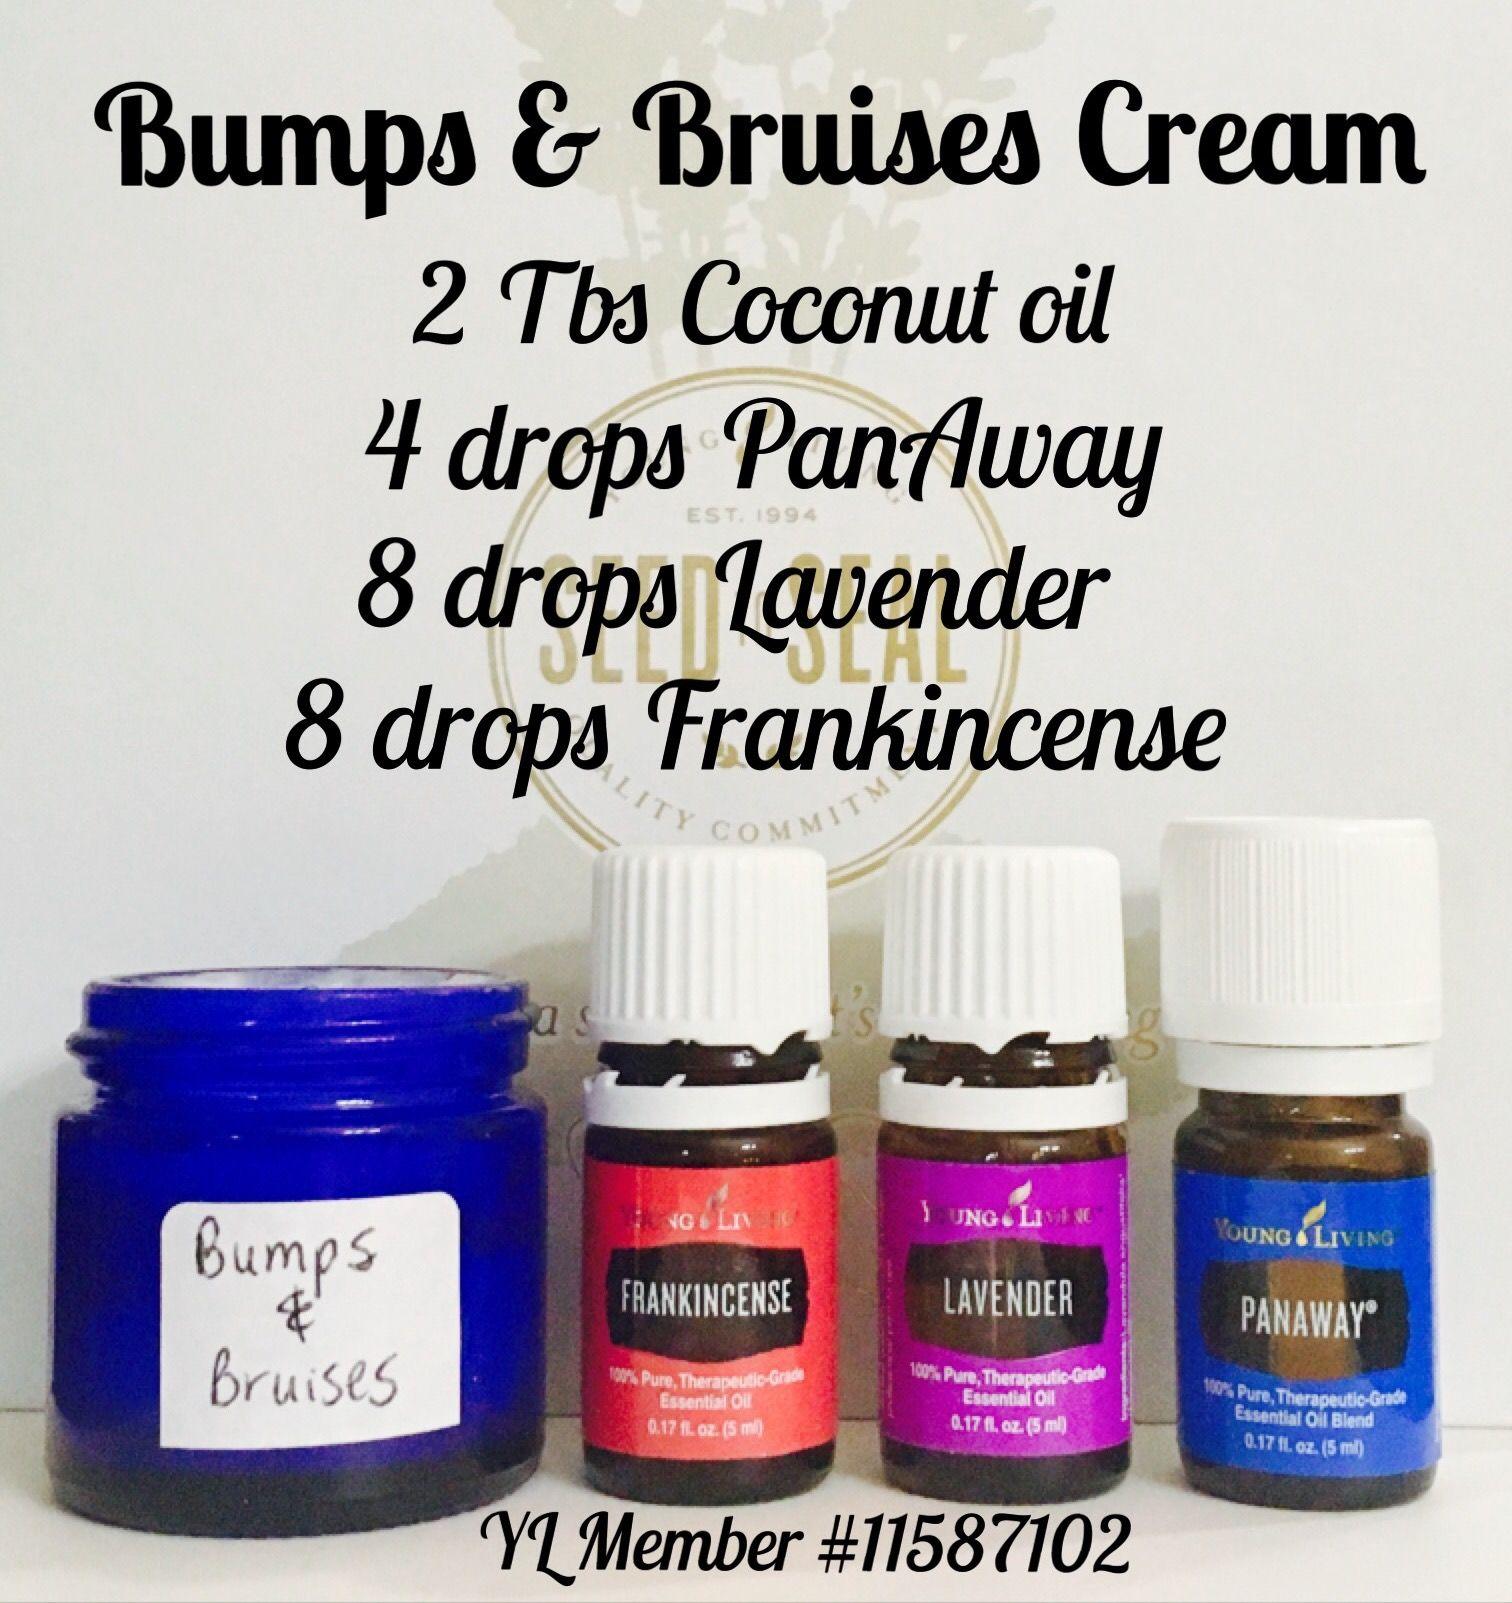 Bumps Amp Bruises Cream Using Frankincense Lavender And